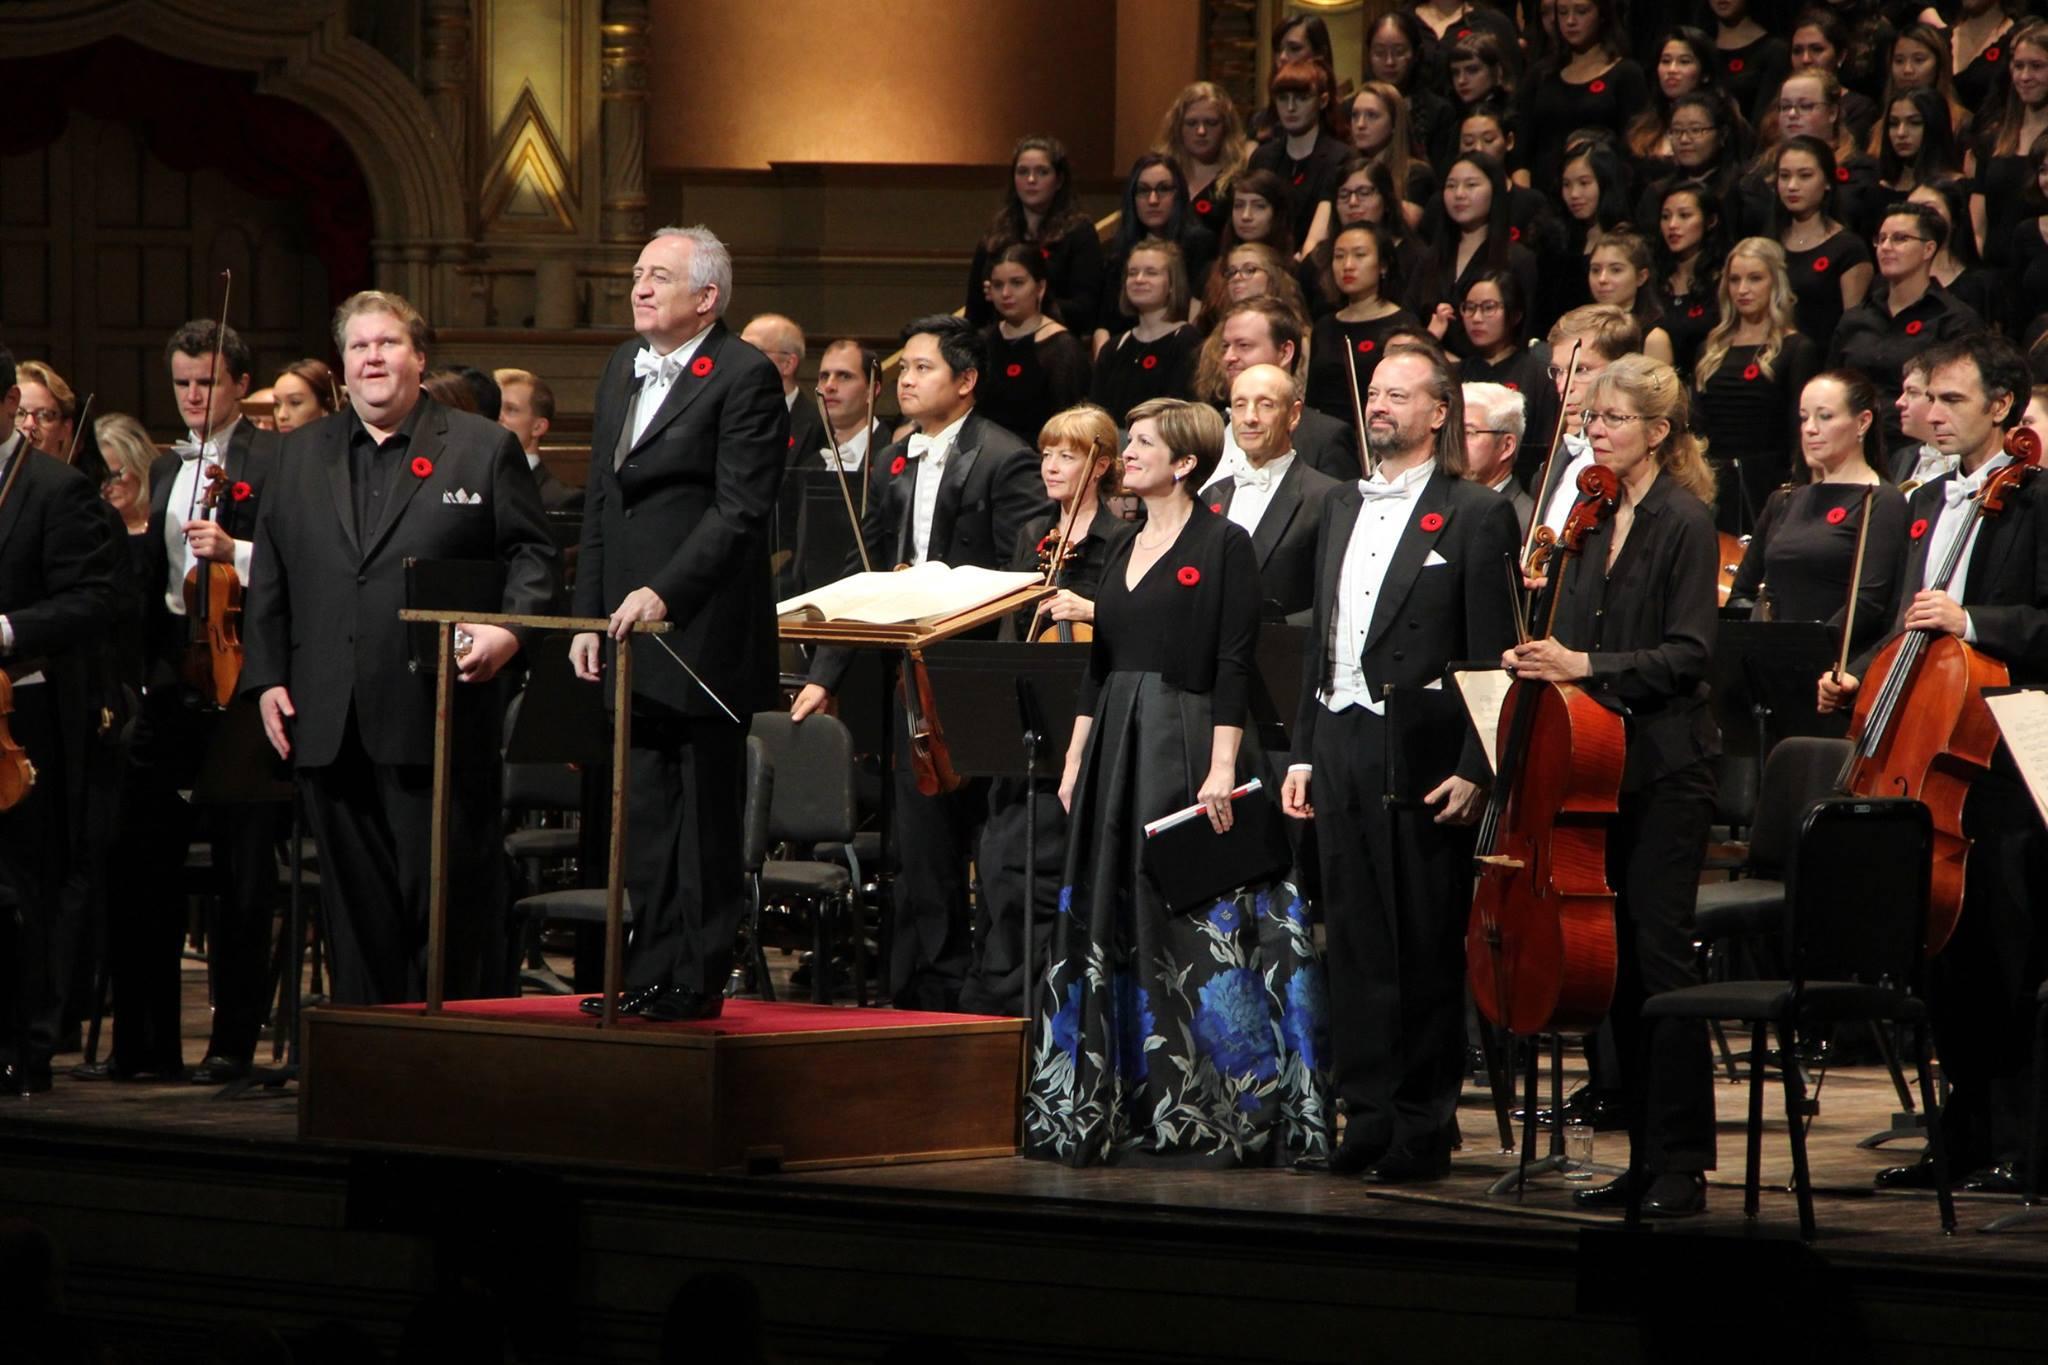 Photos Courtesy Vancouver Symphony Orchestra